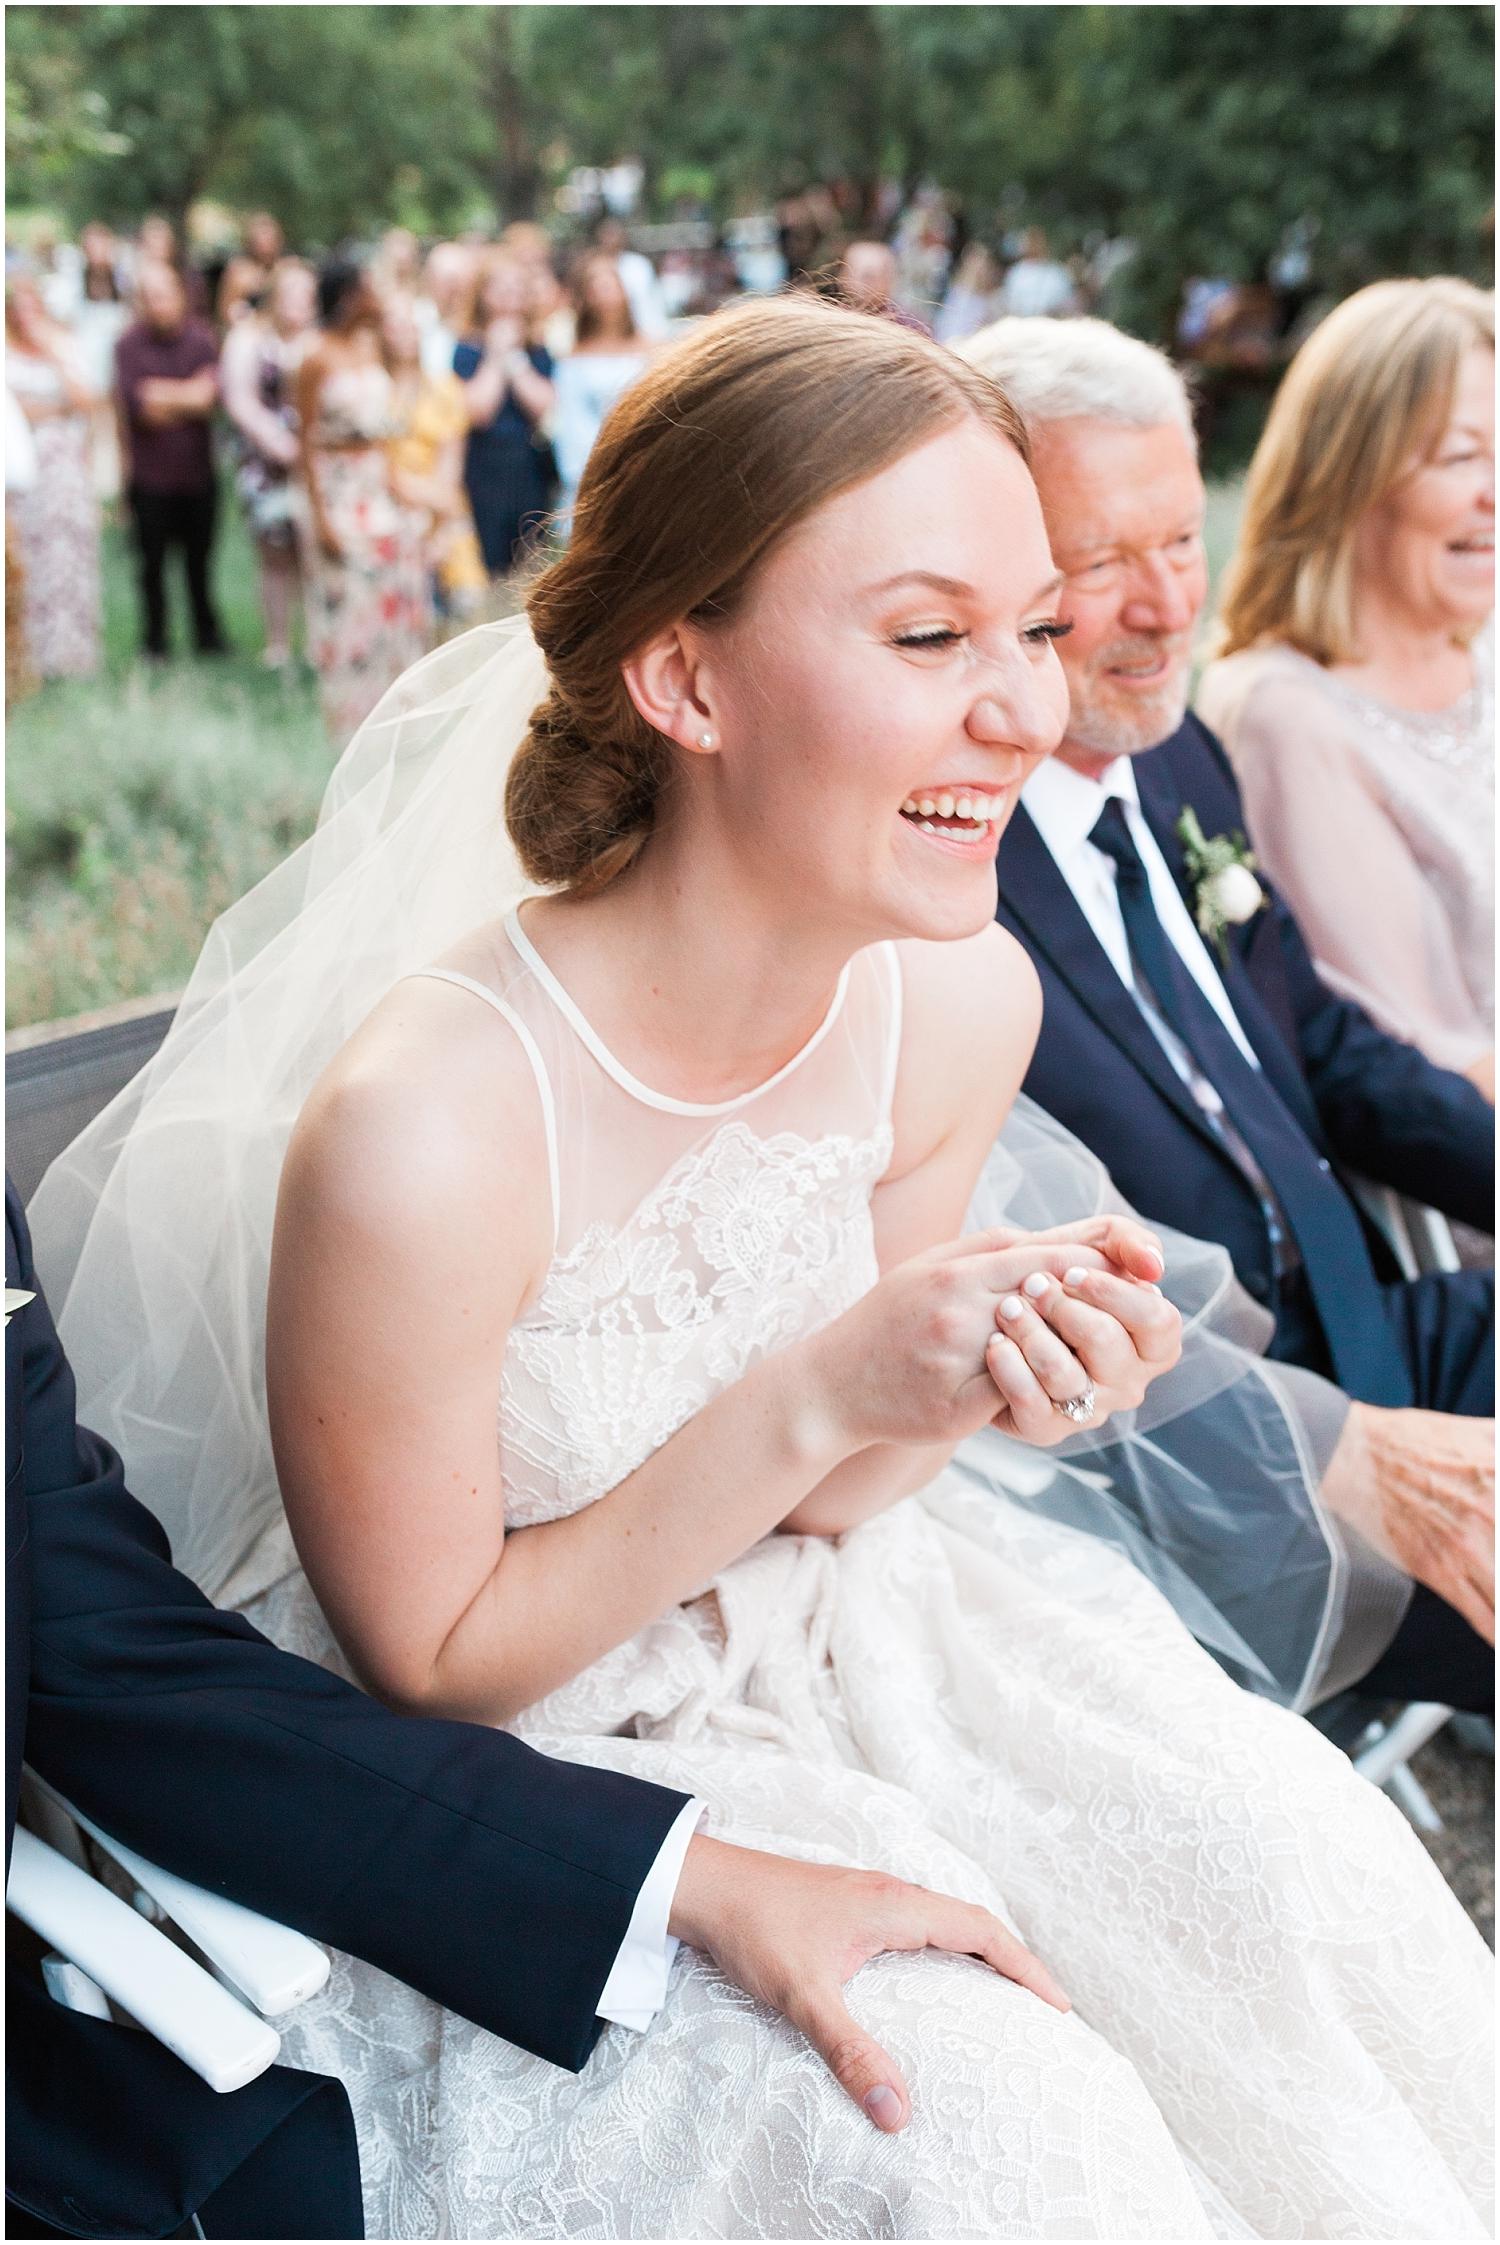 Rachel Reyes Photography-Utah Wedding Photographer-The Villa in Cedar Hills_0052.jpg